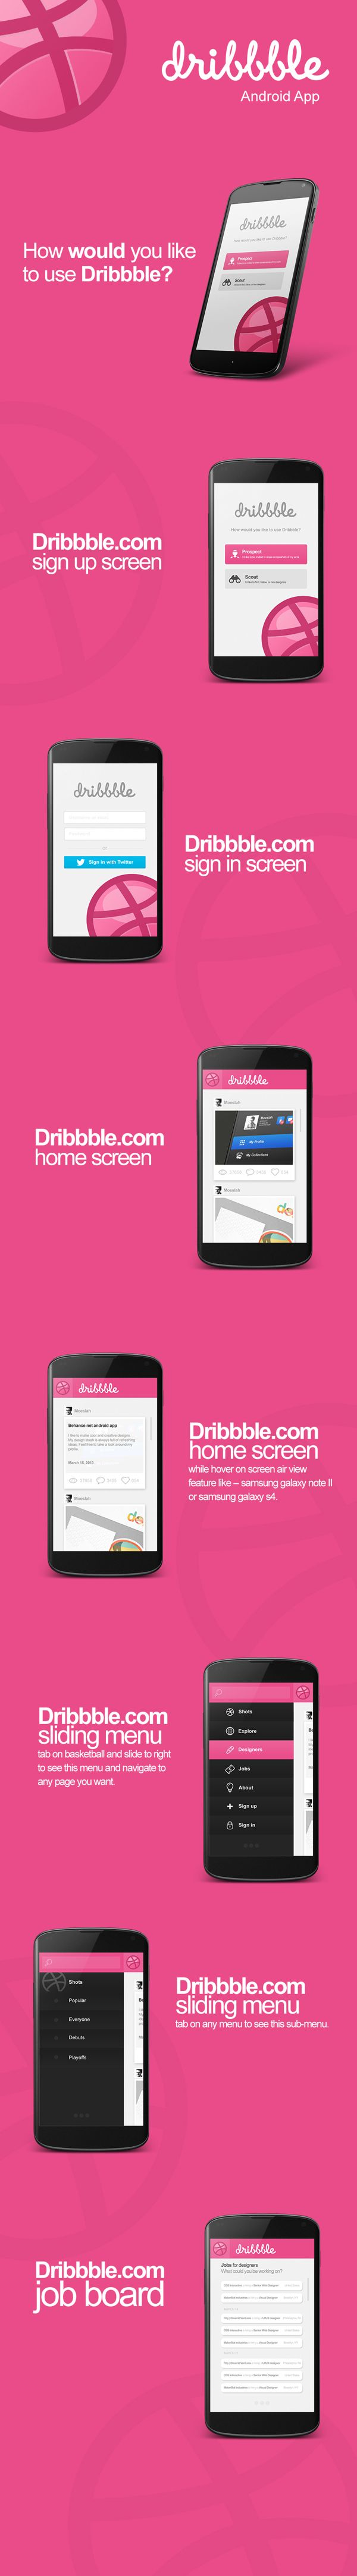 Dribbble.com Android app user interface design by Moe slah, via Behance